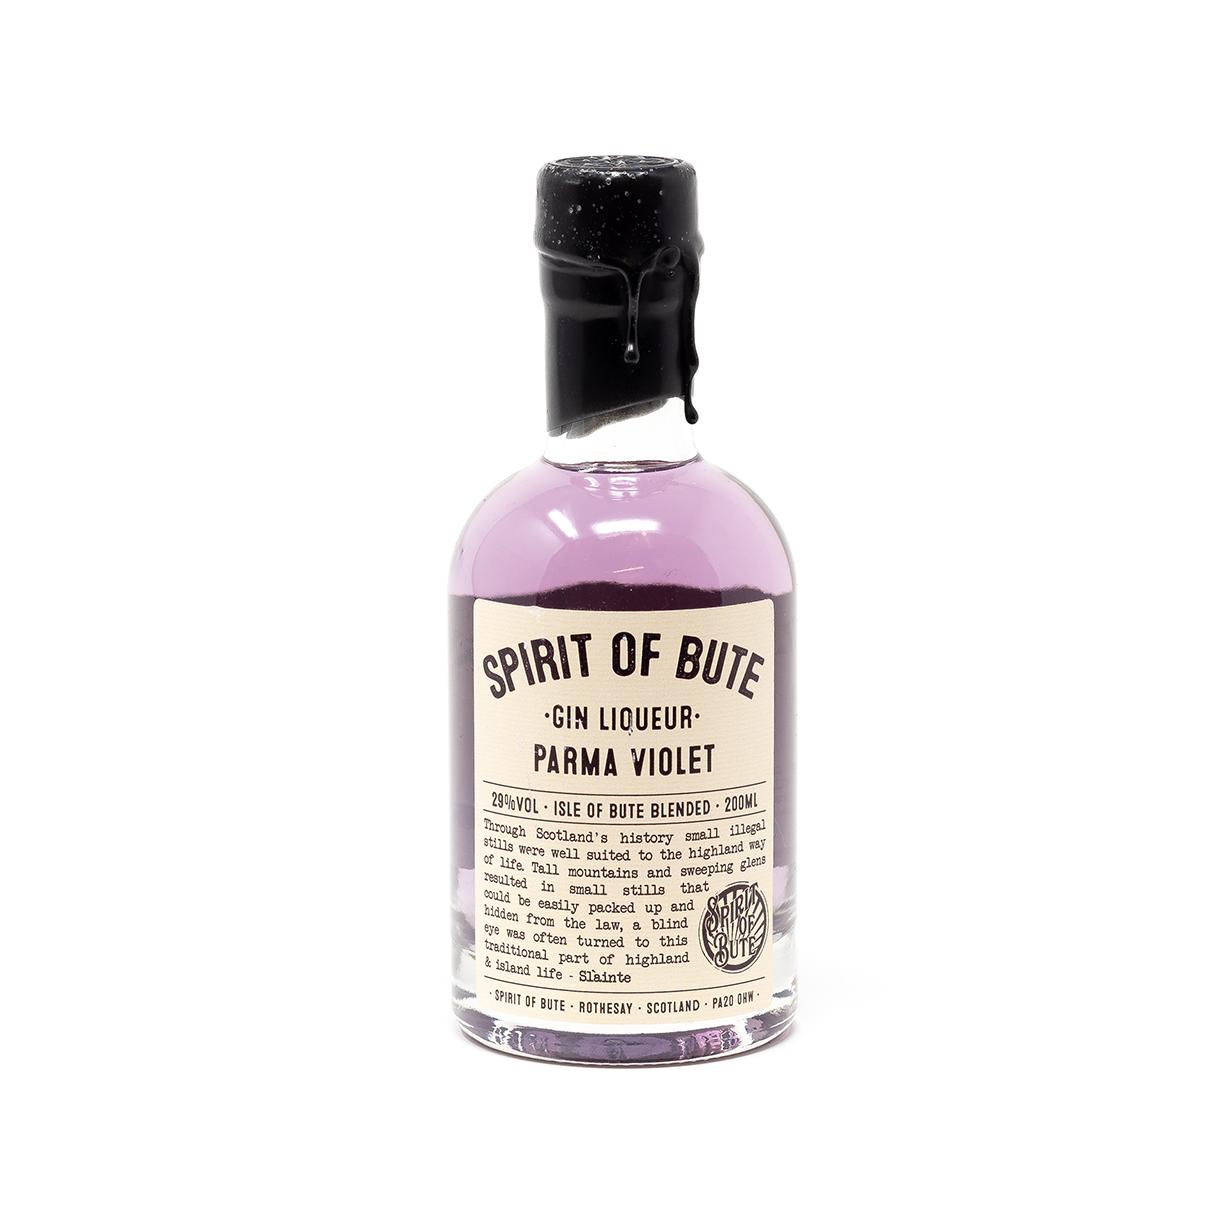 SOB Gin Liqueur (Parma Violet)